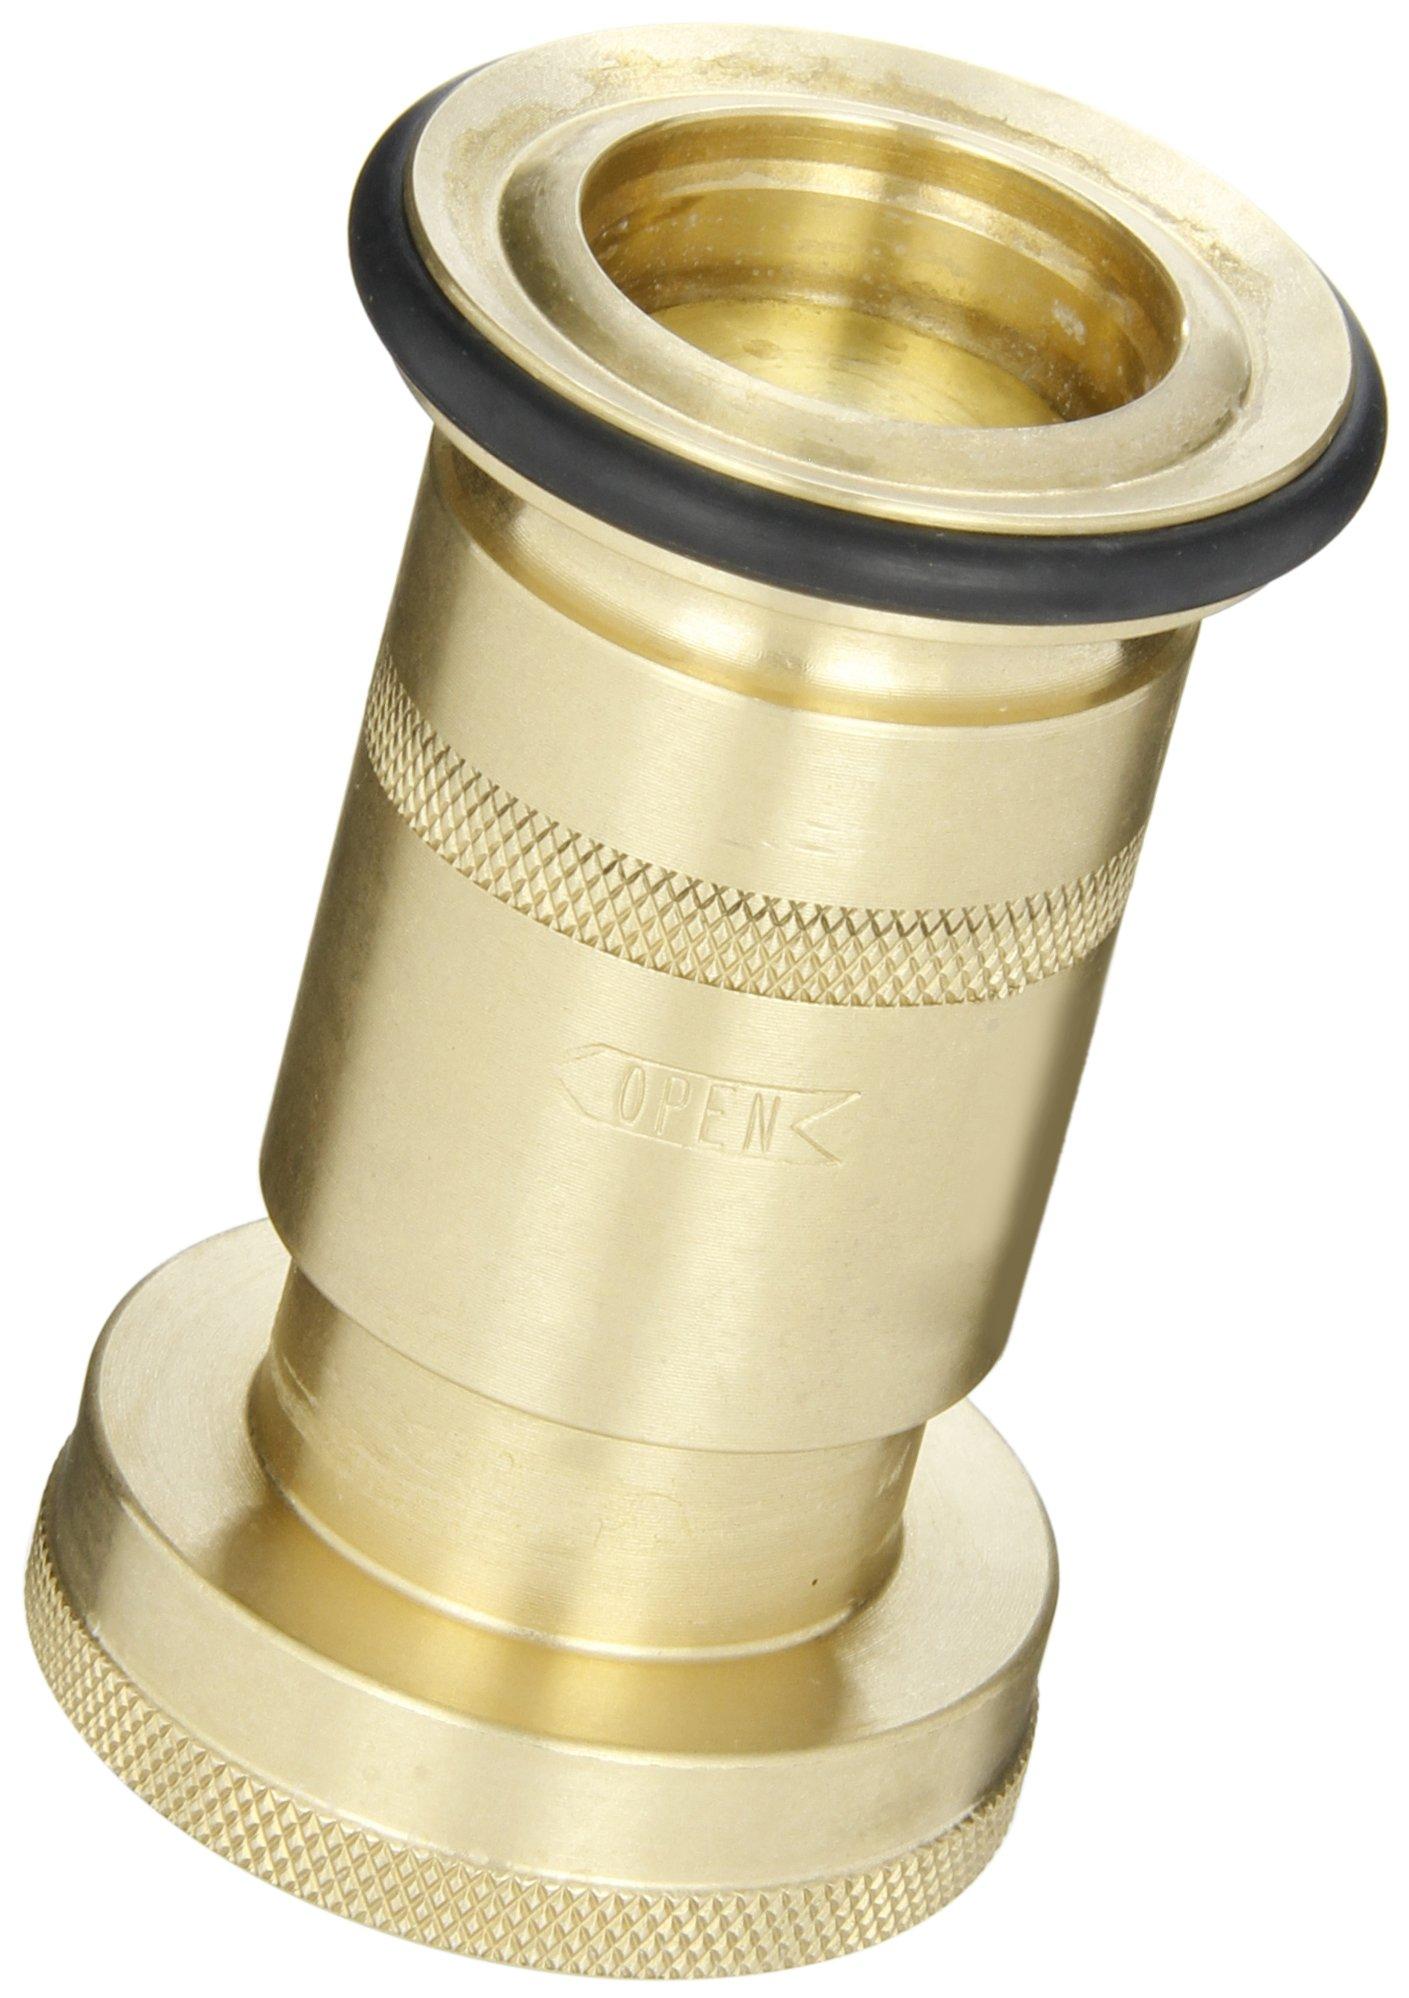 Dixon Valve BFN150 Brass Fire Equipment, Industrial Fog Nozzle, 1-1/2'' NPSH